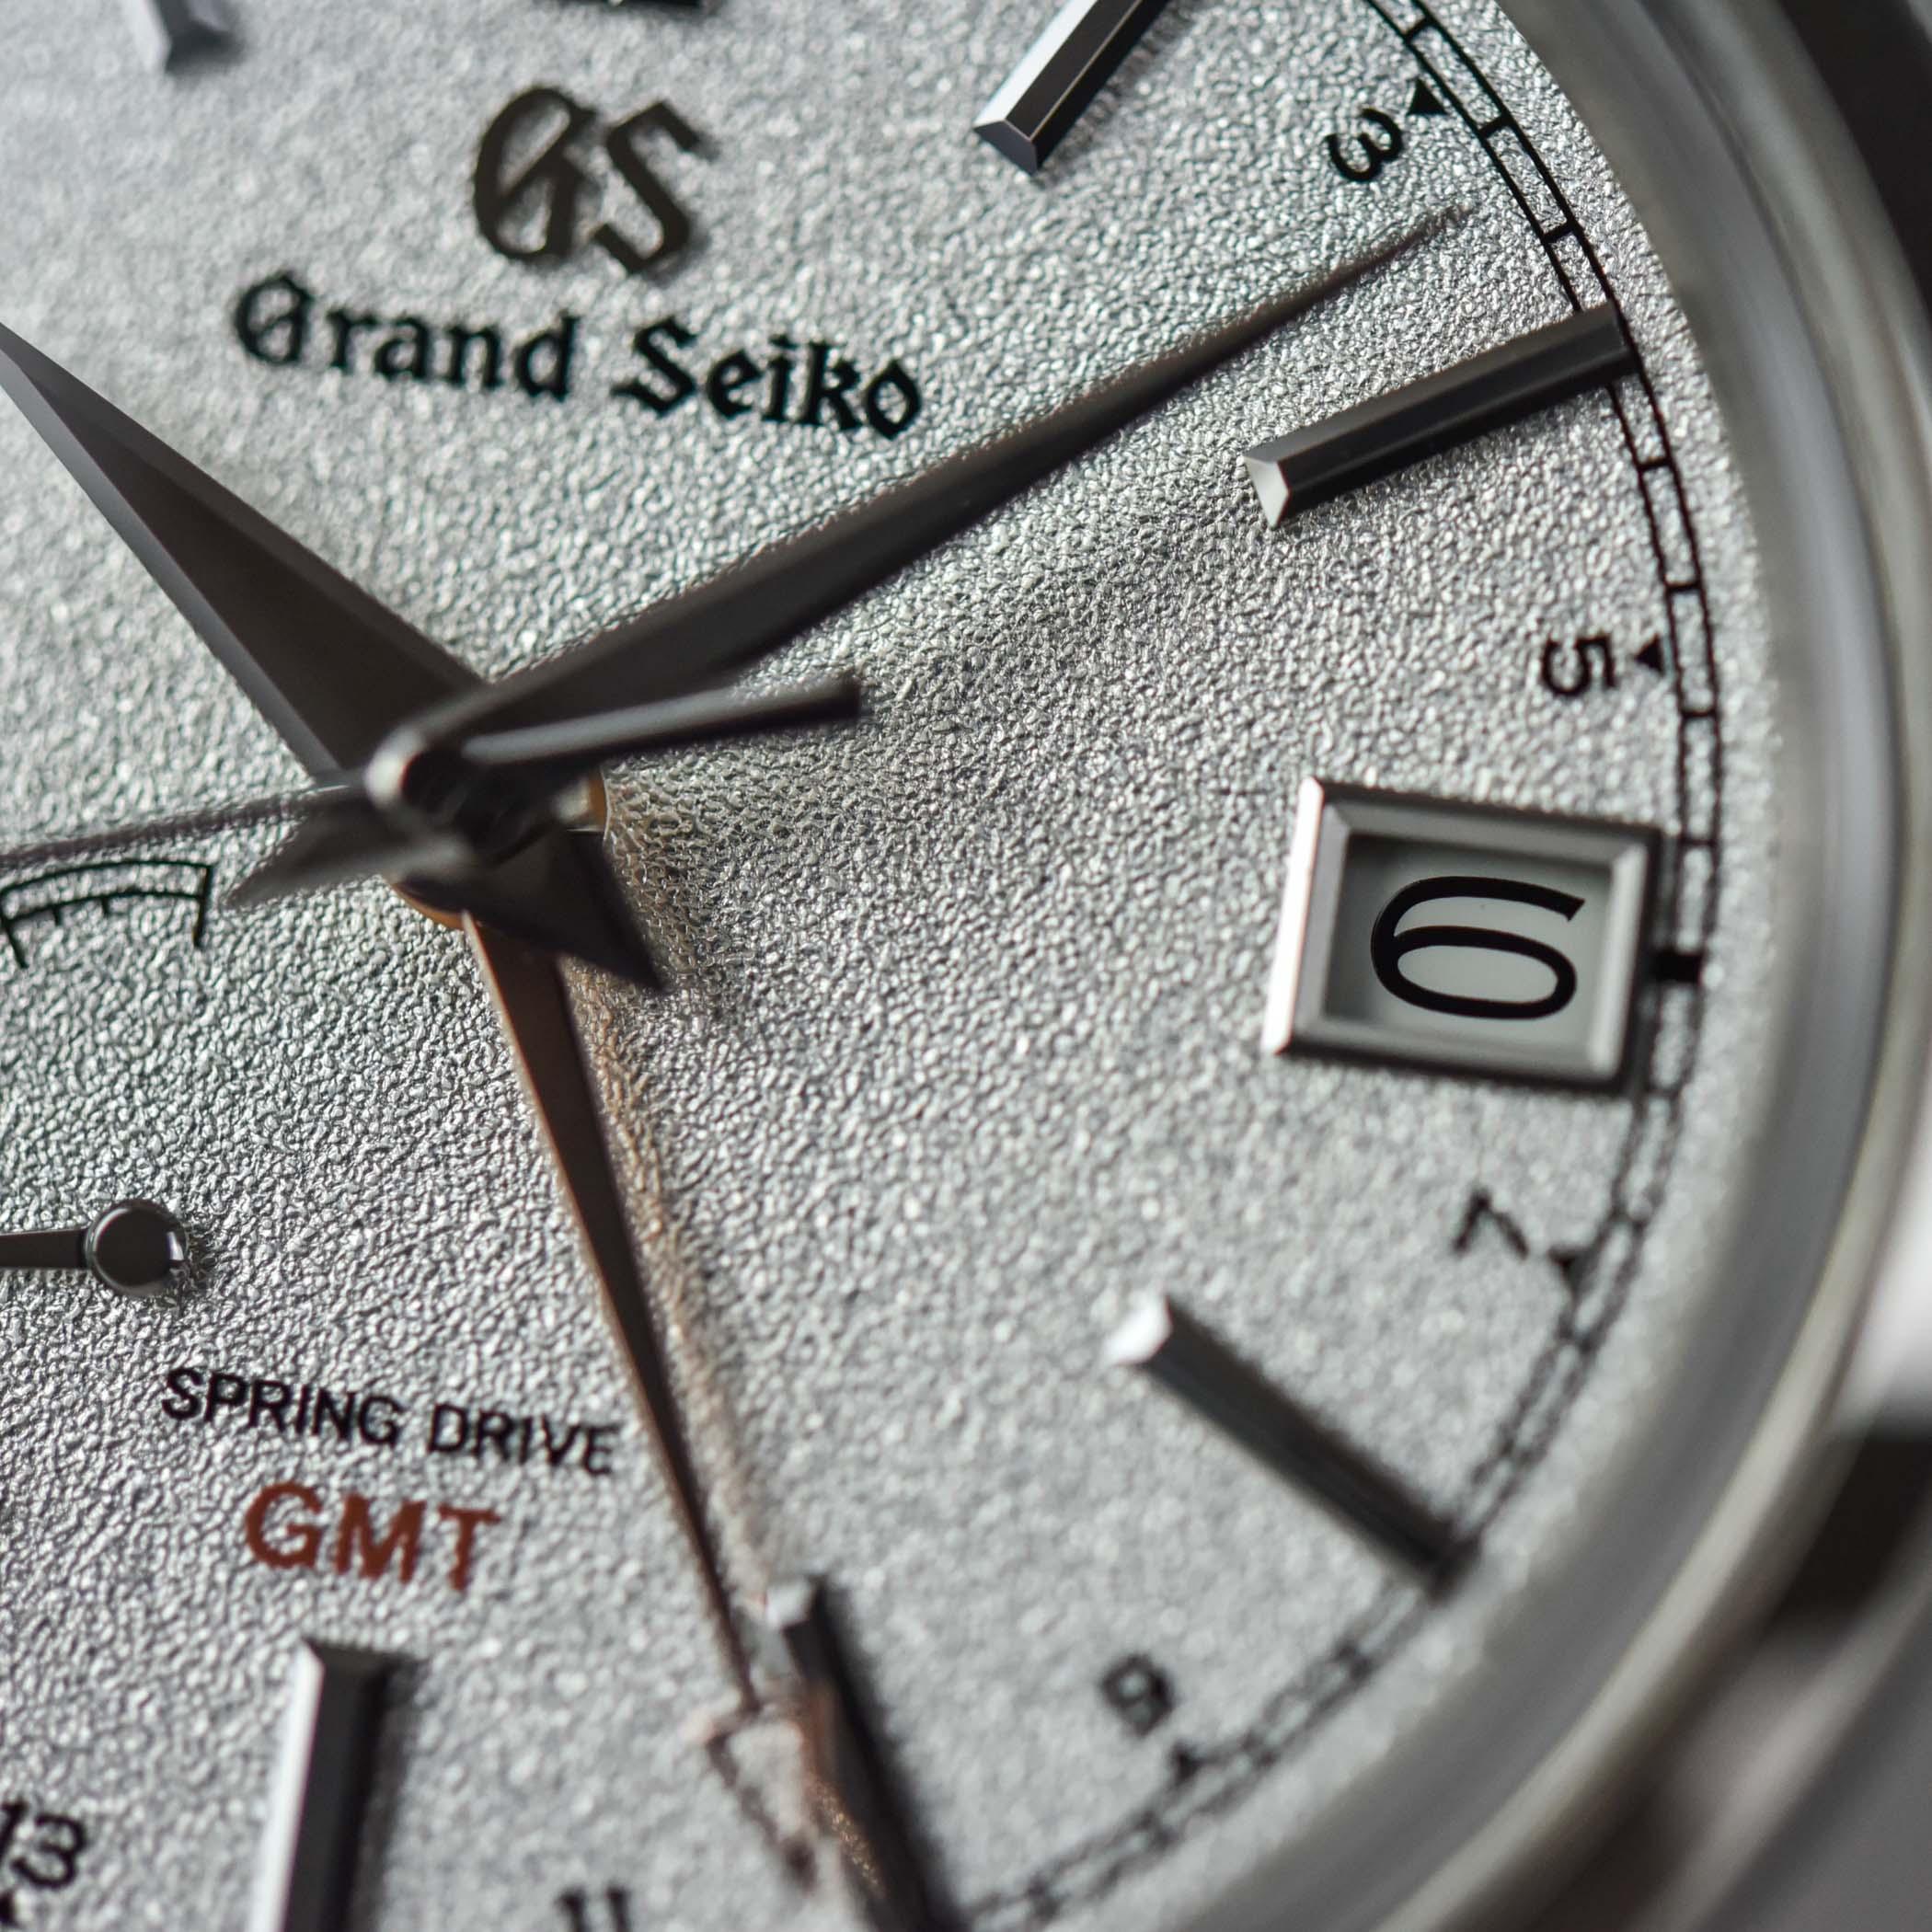 Grand Seiko Elegance GMT Spring Drive 4 seasons collection SBGE269